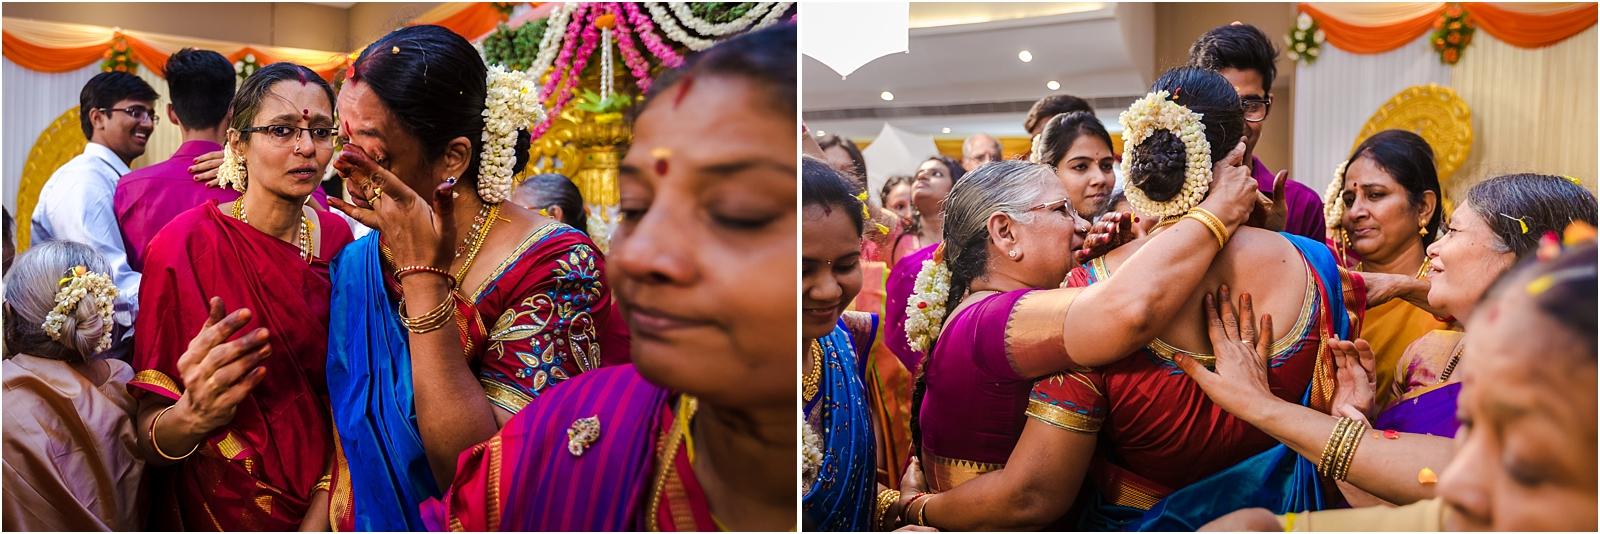 14042017-Achu-Deepthi-Wedding-1124.jpg